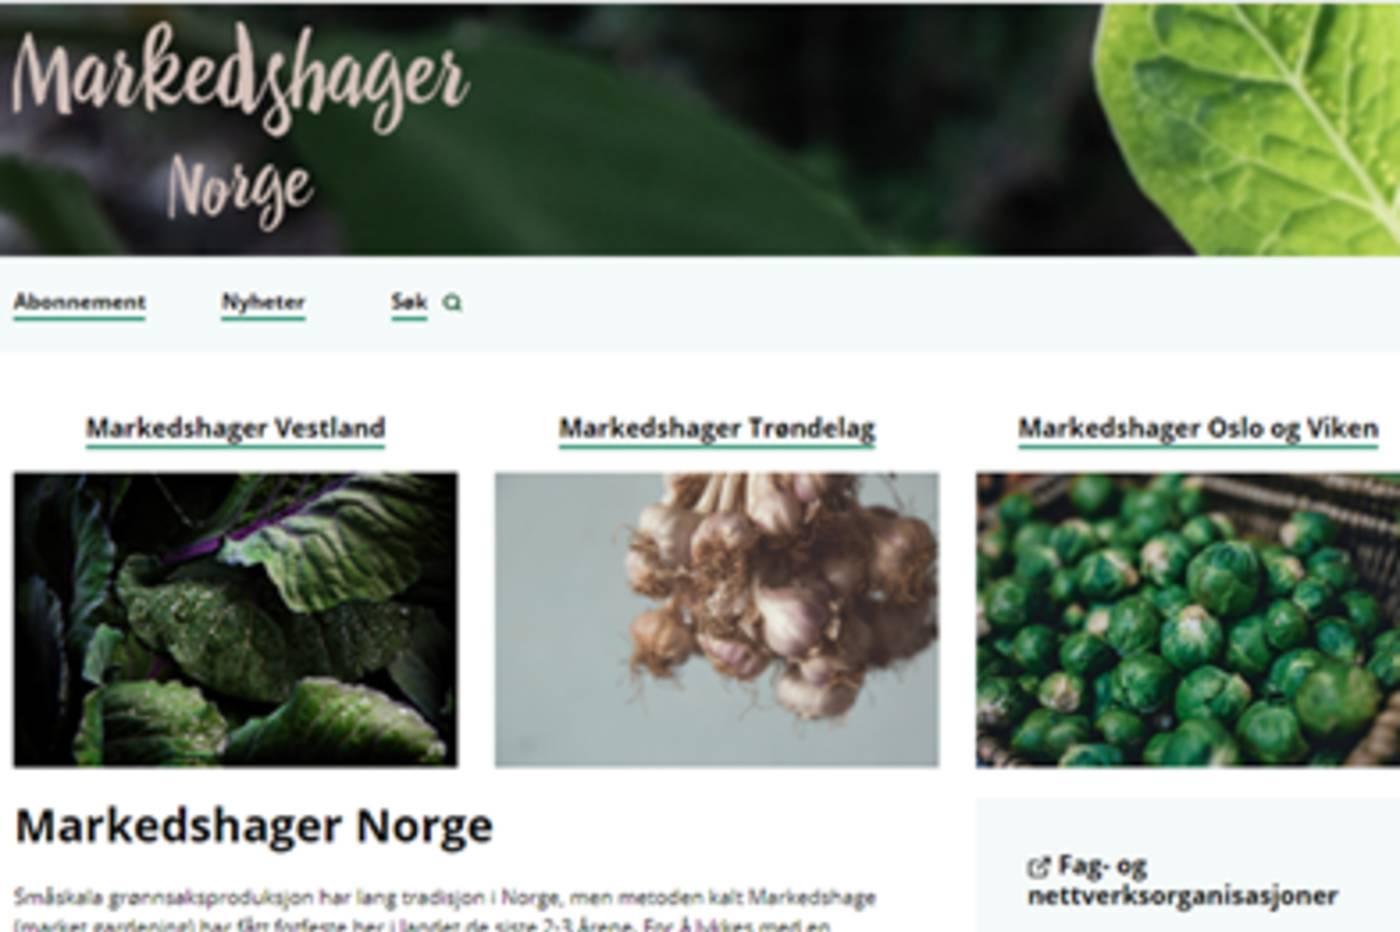 www.markedshage.no